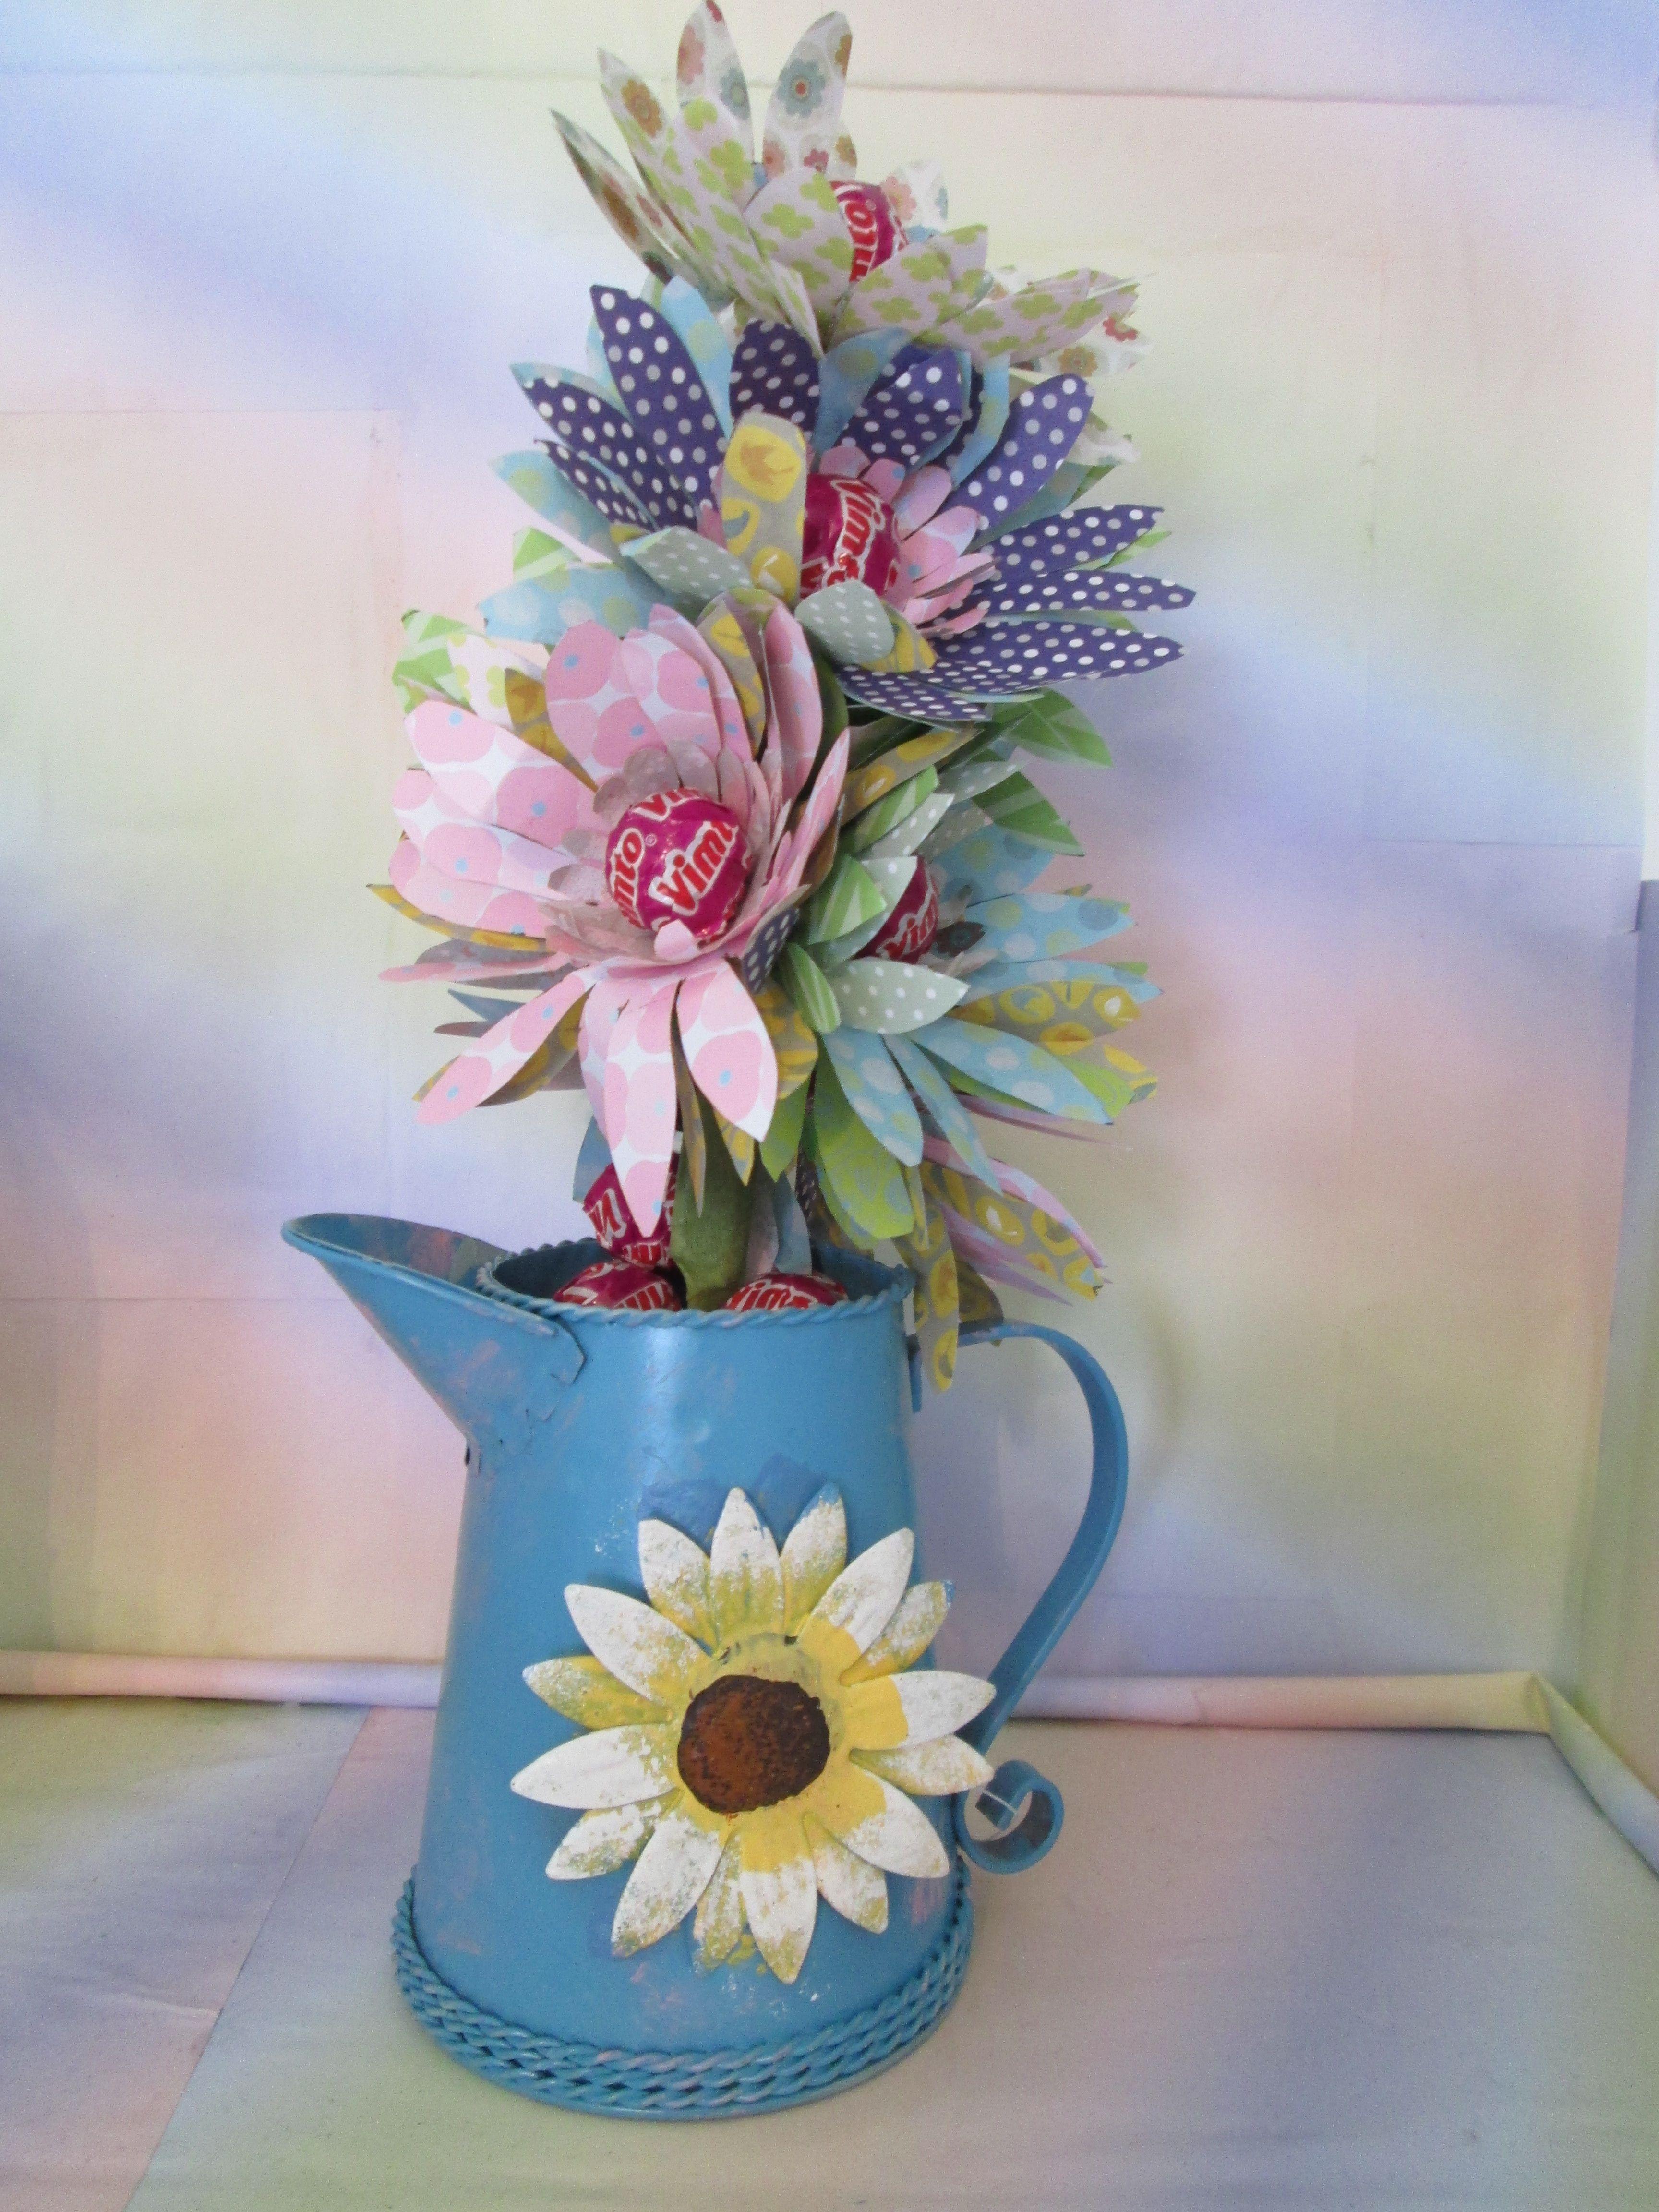 Retro Vimto Lolly flower display in metal watering can | My Sweet ...